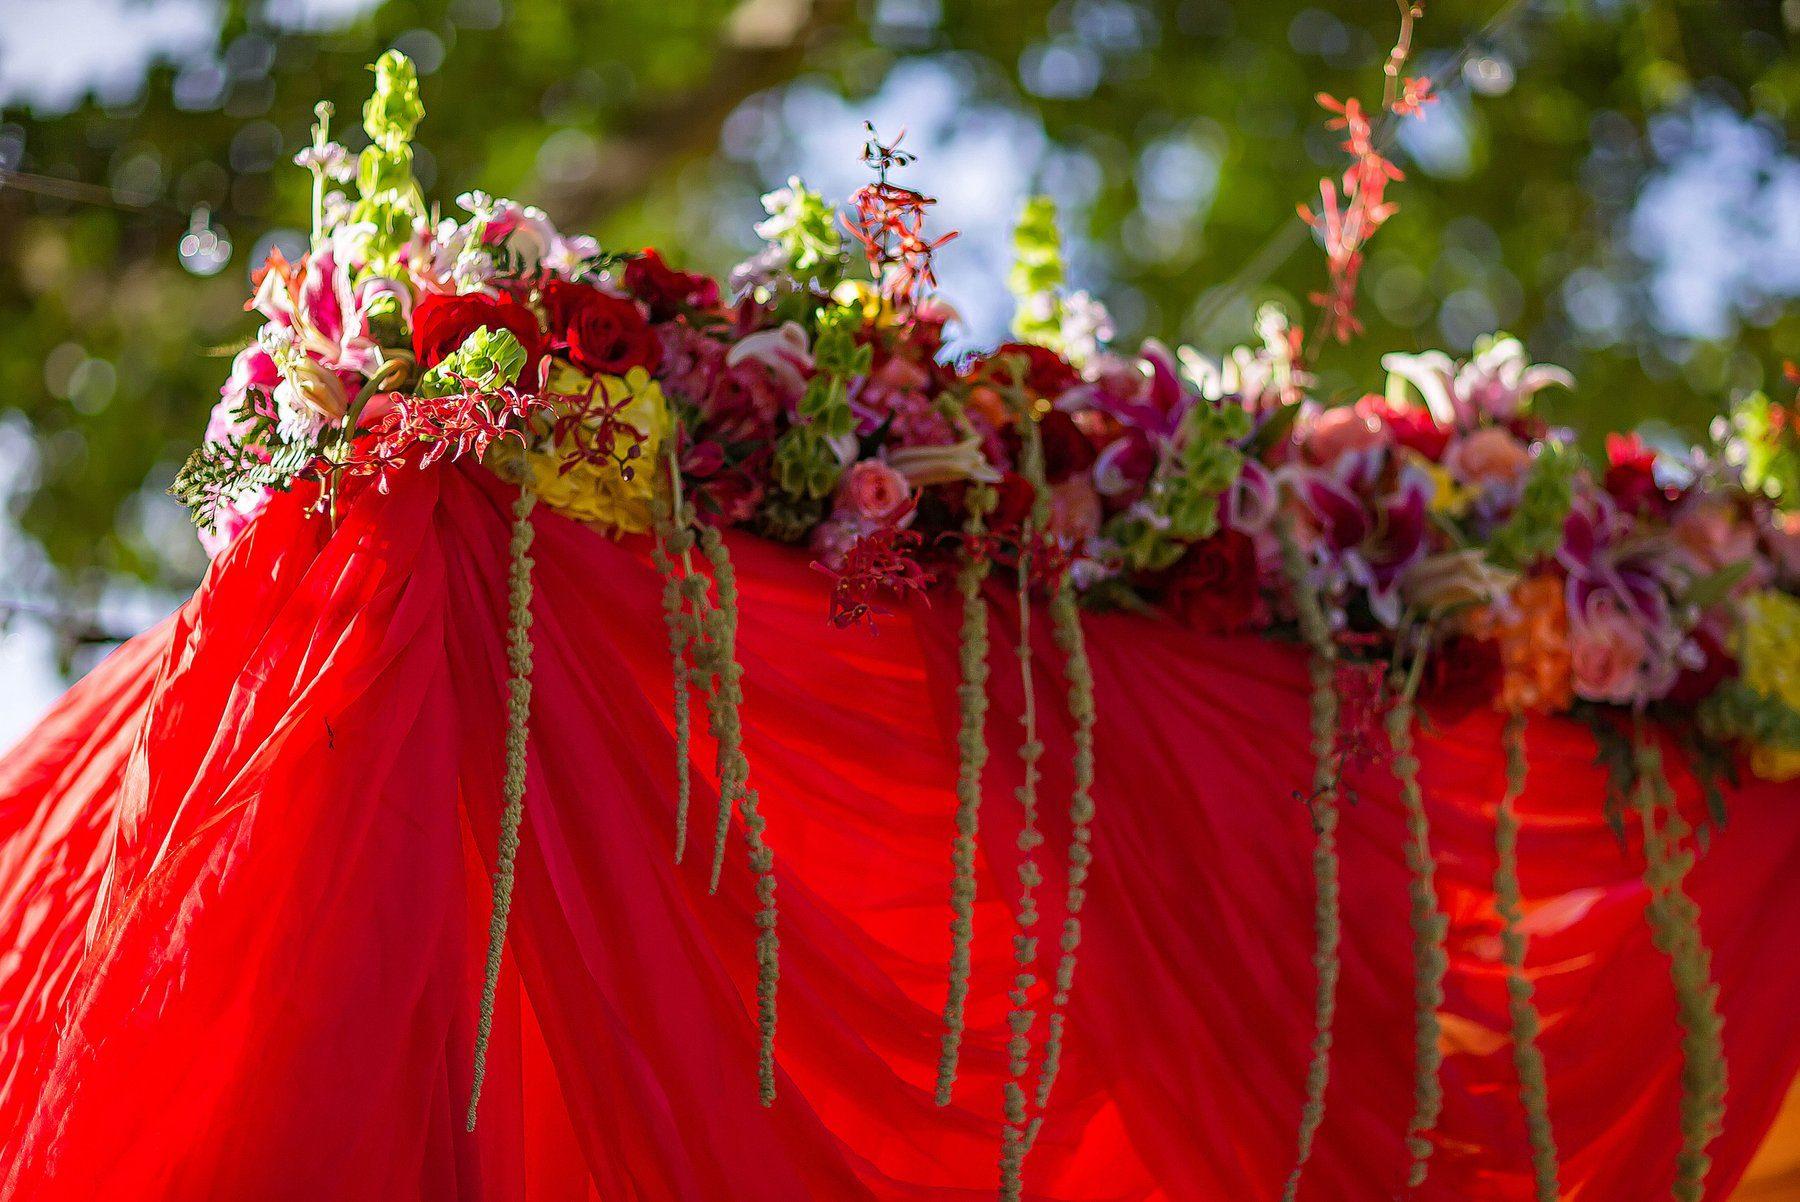 Kinjal | Indian Wedding Decoraton | Boca Raton, The Addison | Best Wedding Venues in the Miami area for Indian Weddings, Miami Wedding Photographers | Häring Photography, Indian Wedding Photographer in Florida, Best Muslim, Hindu - South East Asian Wedding Photographers